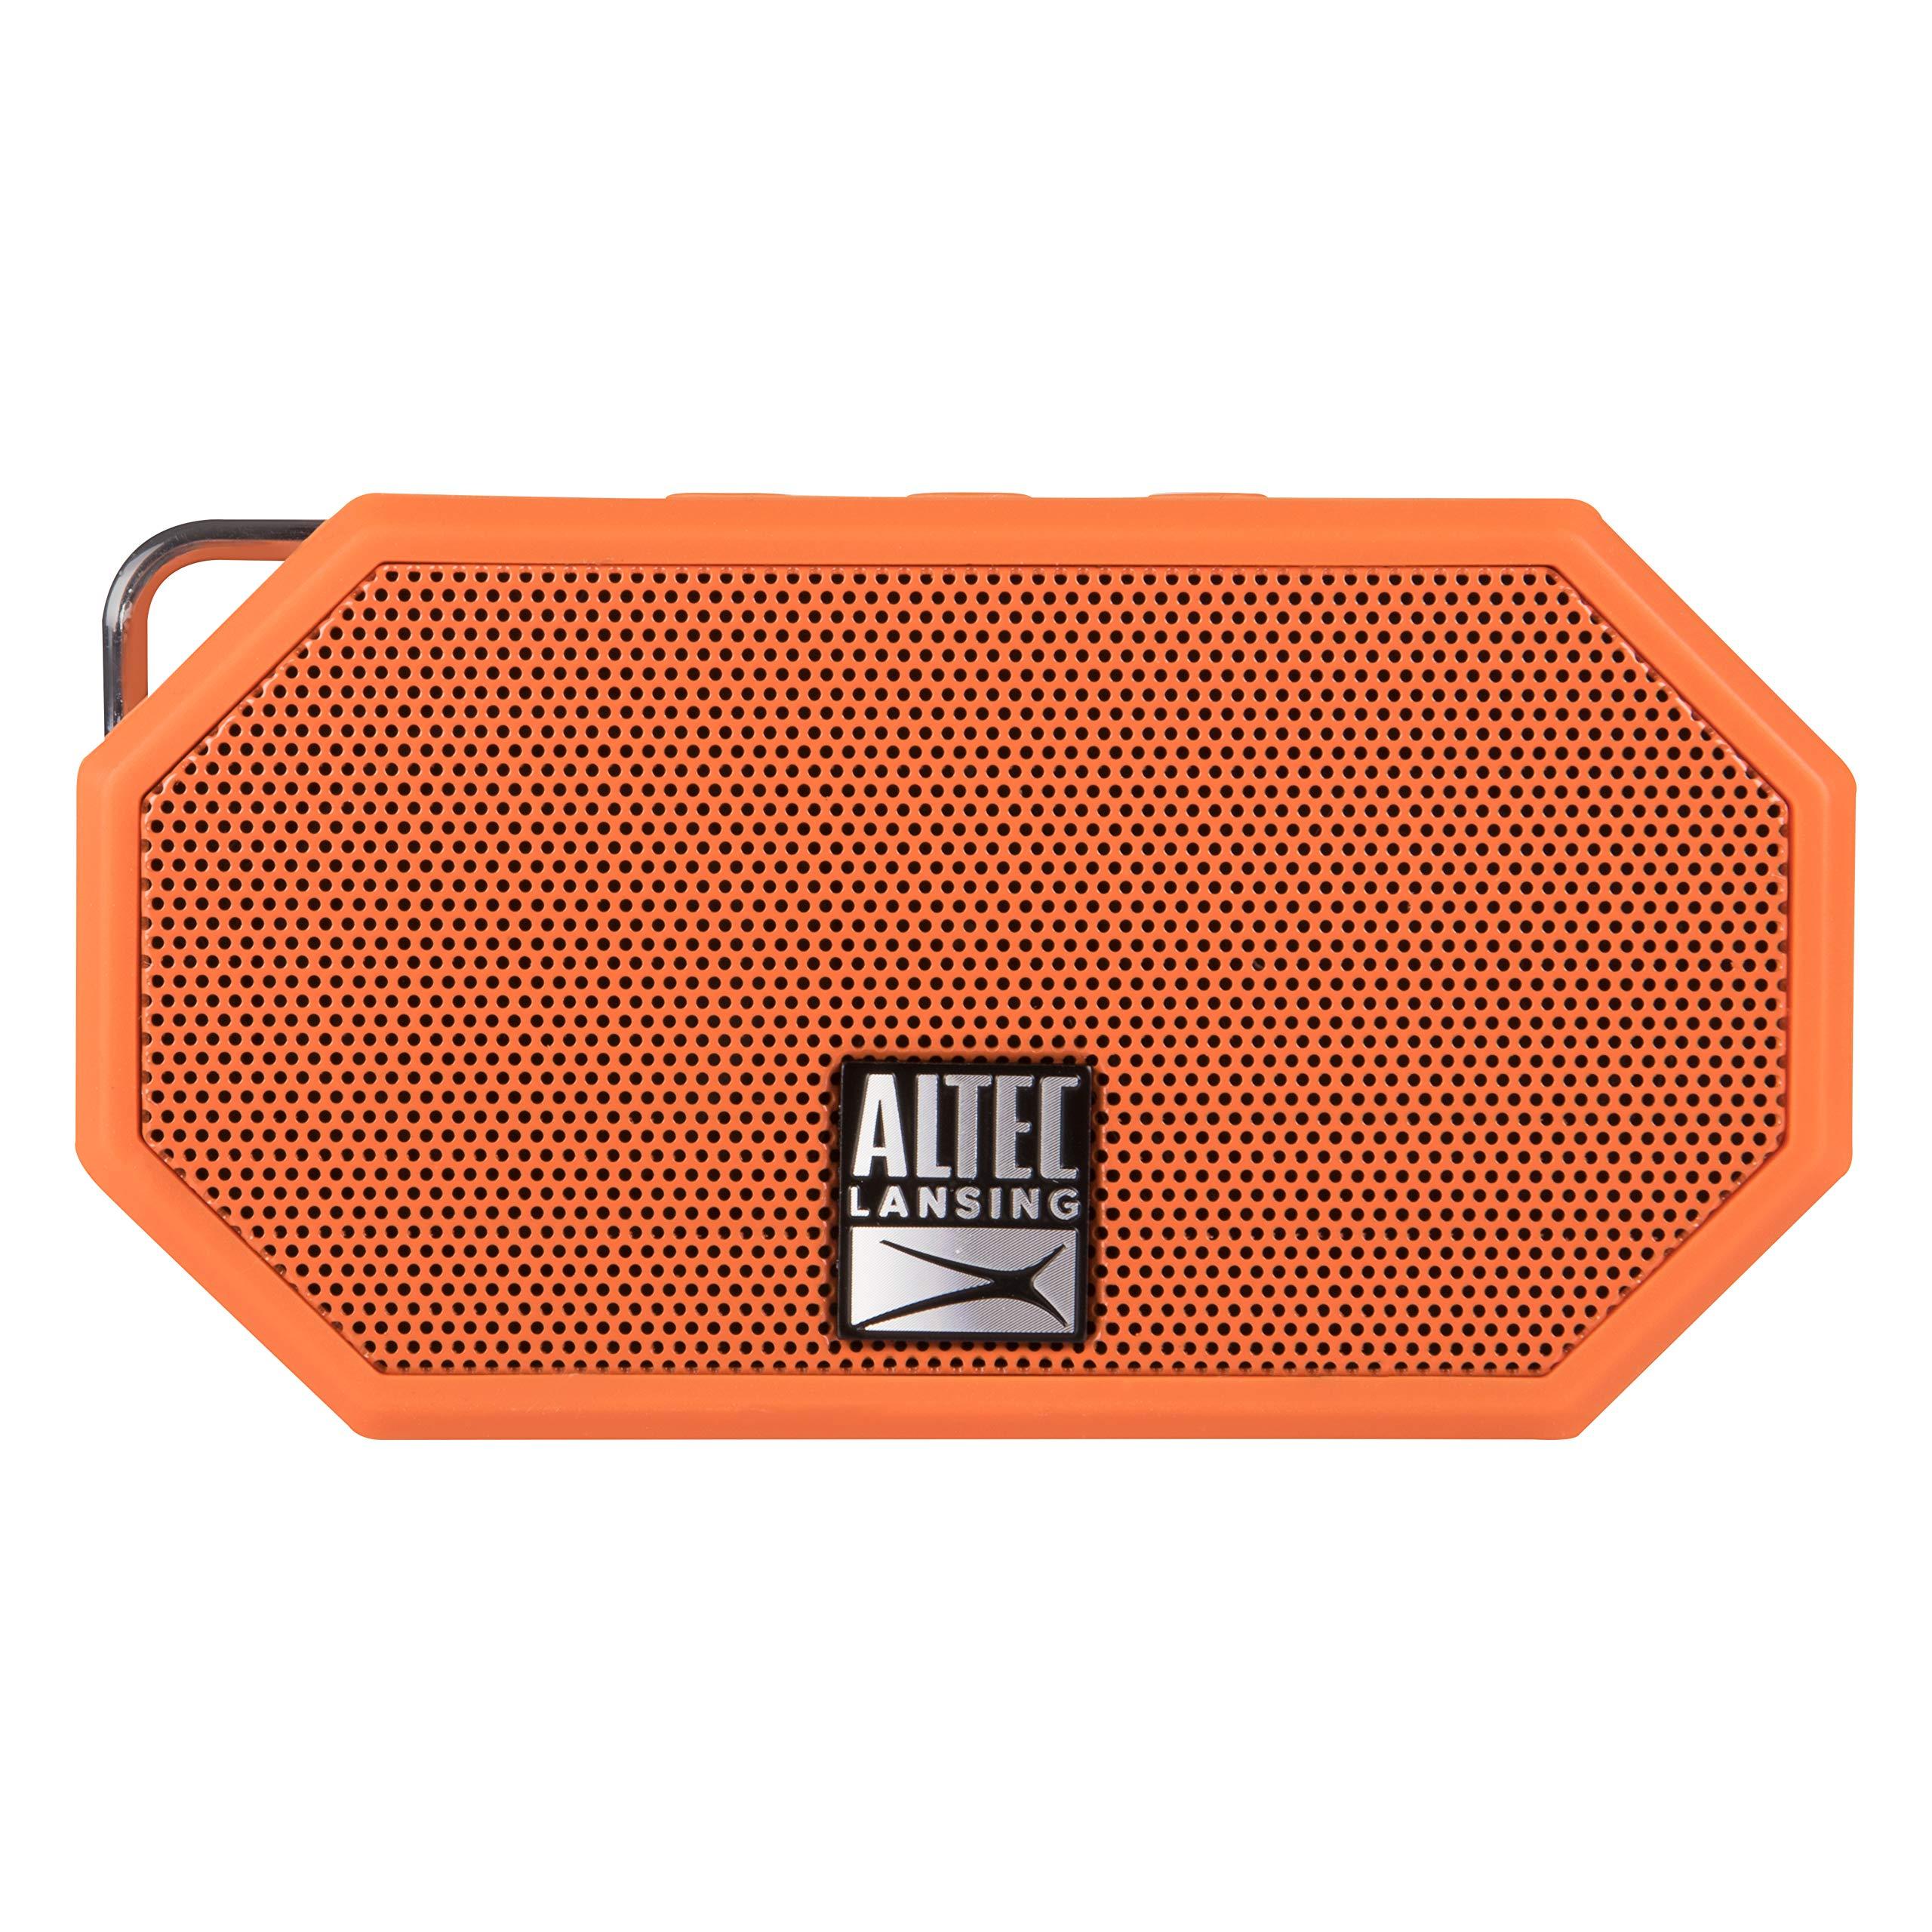 Altec Lansing Mini H2O -  Wireless, Bluetooth, Waterproof Speaker, Floating, IP67, Portable Speaker, Strong Bass, Rich Stereo System, Microphone, 30 ft Range, Lightweight, 6-Hour Battery, (Orange)